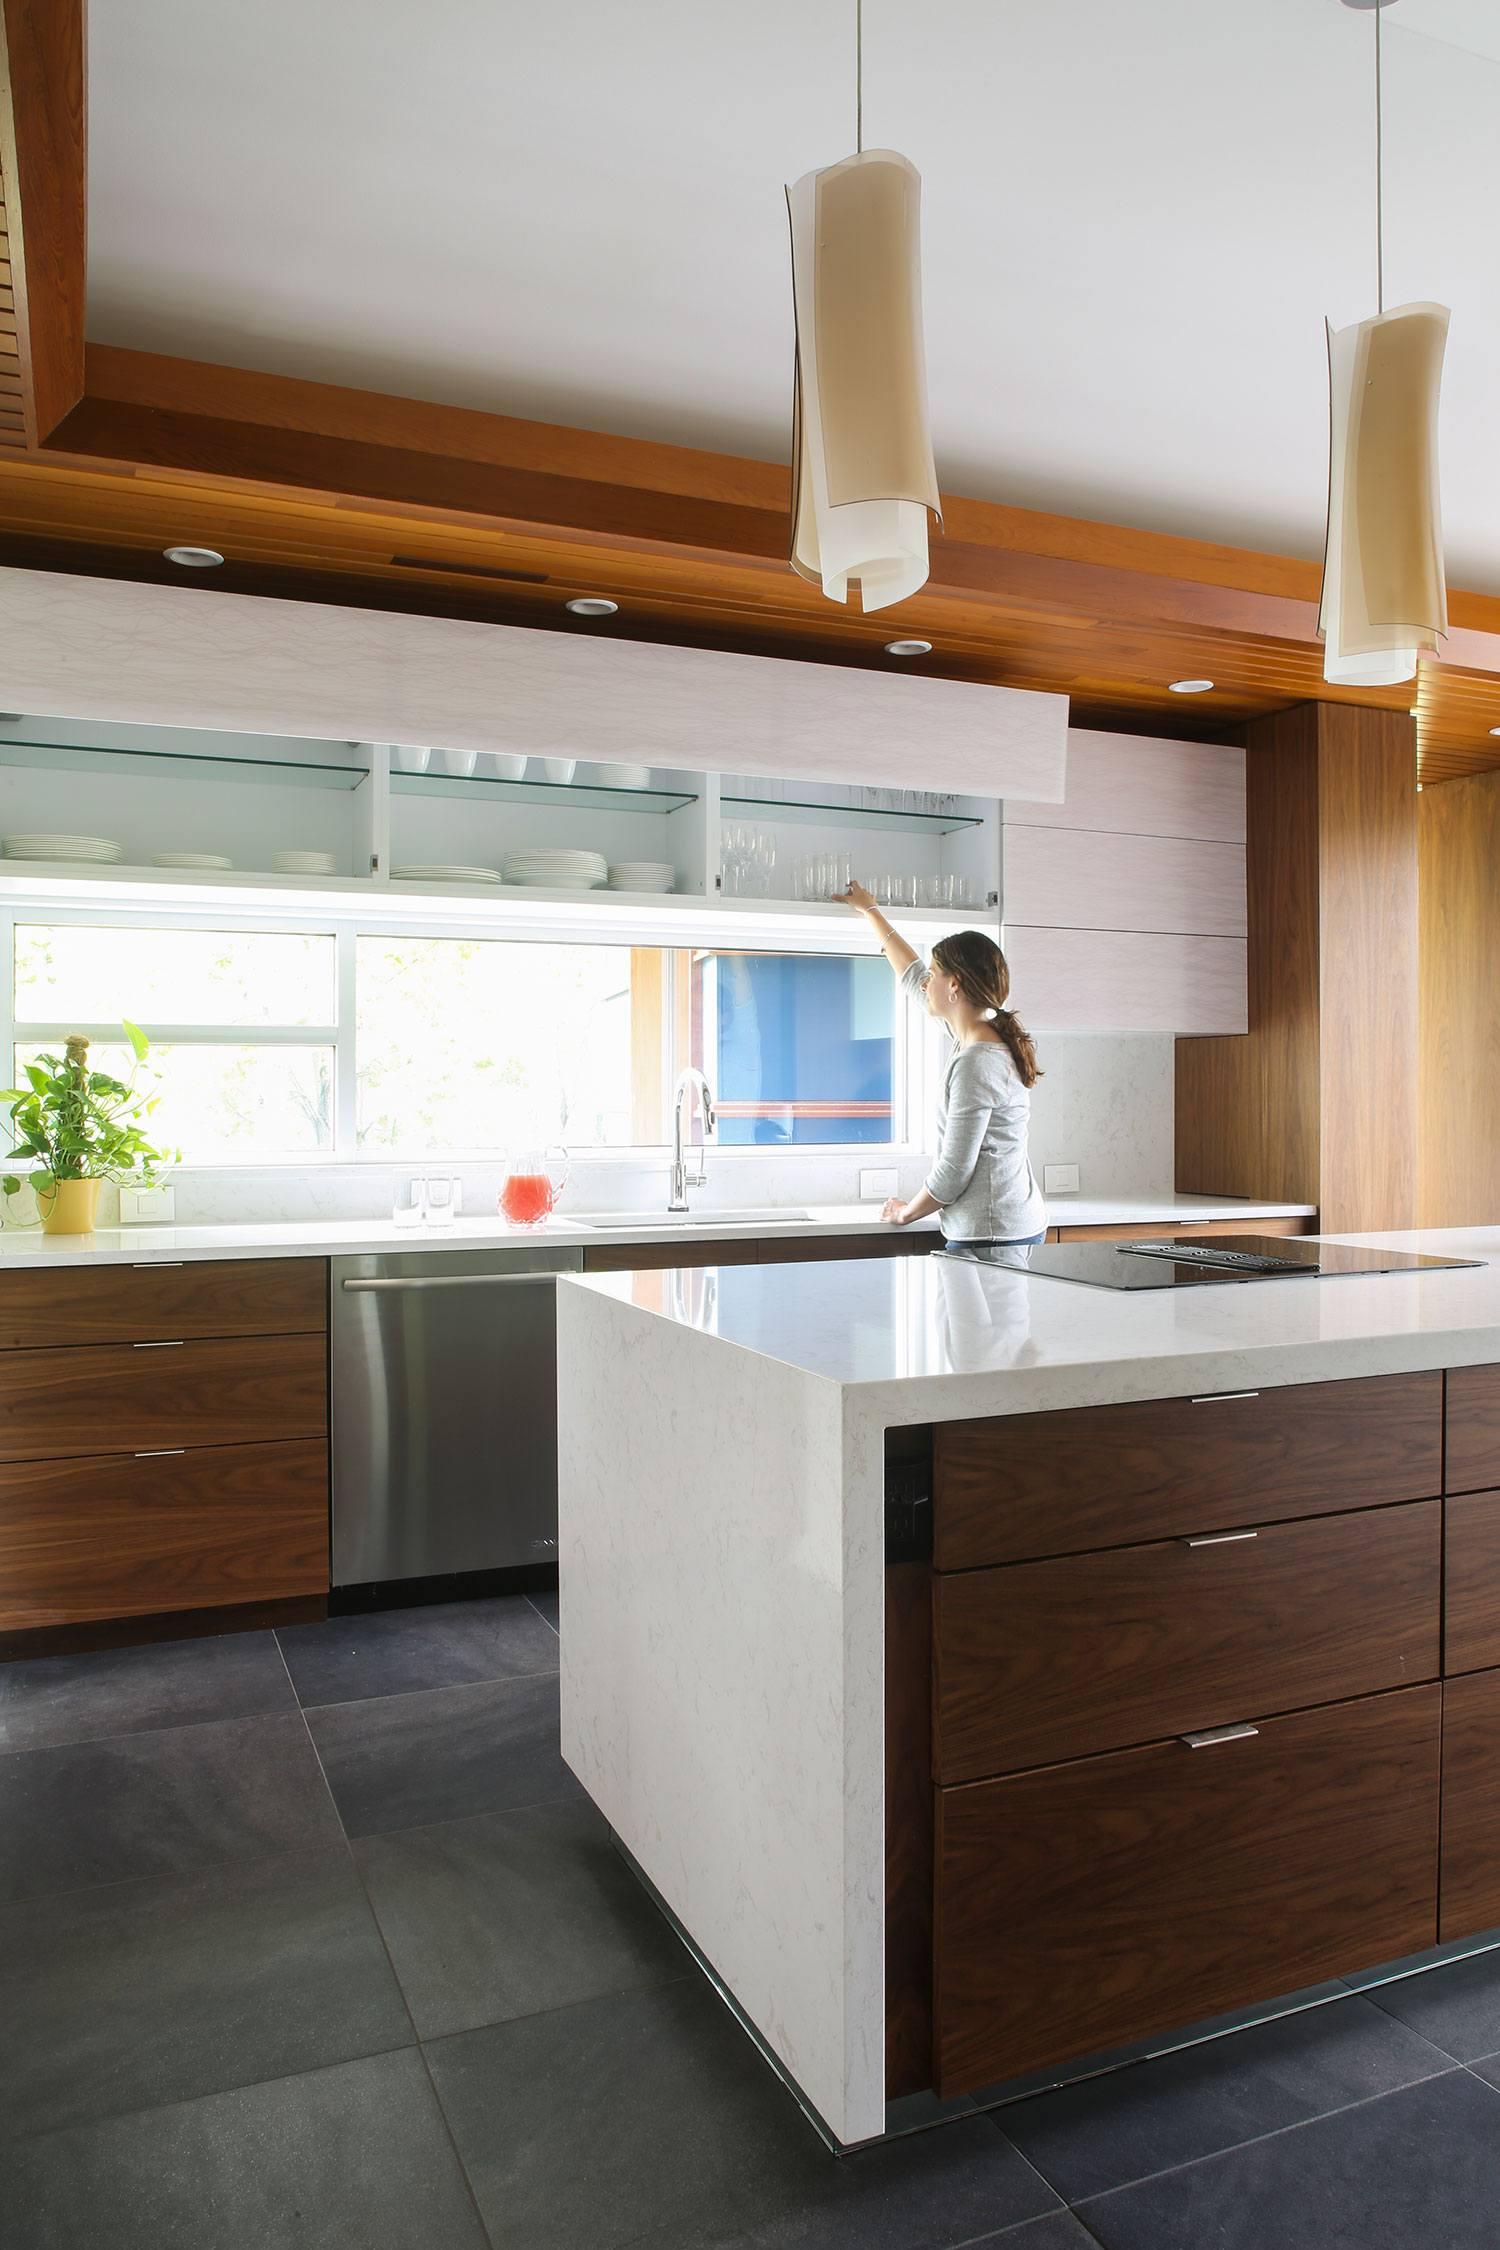 lake-house-kitchen-water-treatment-system.jpg